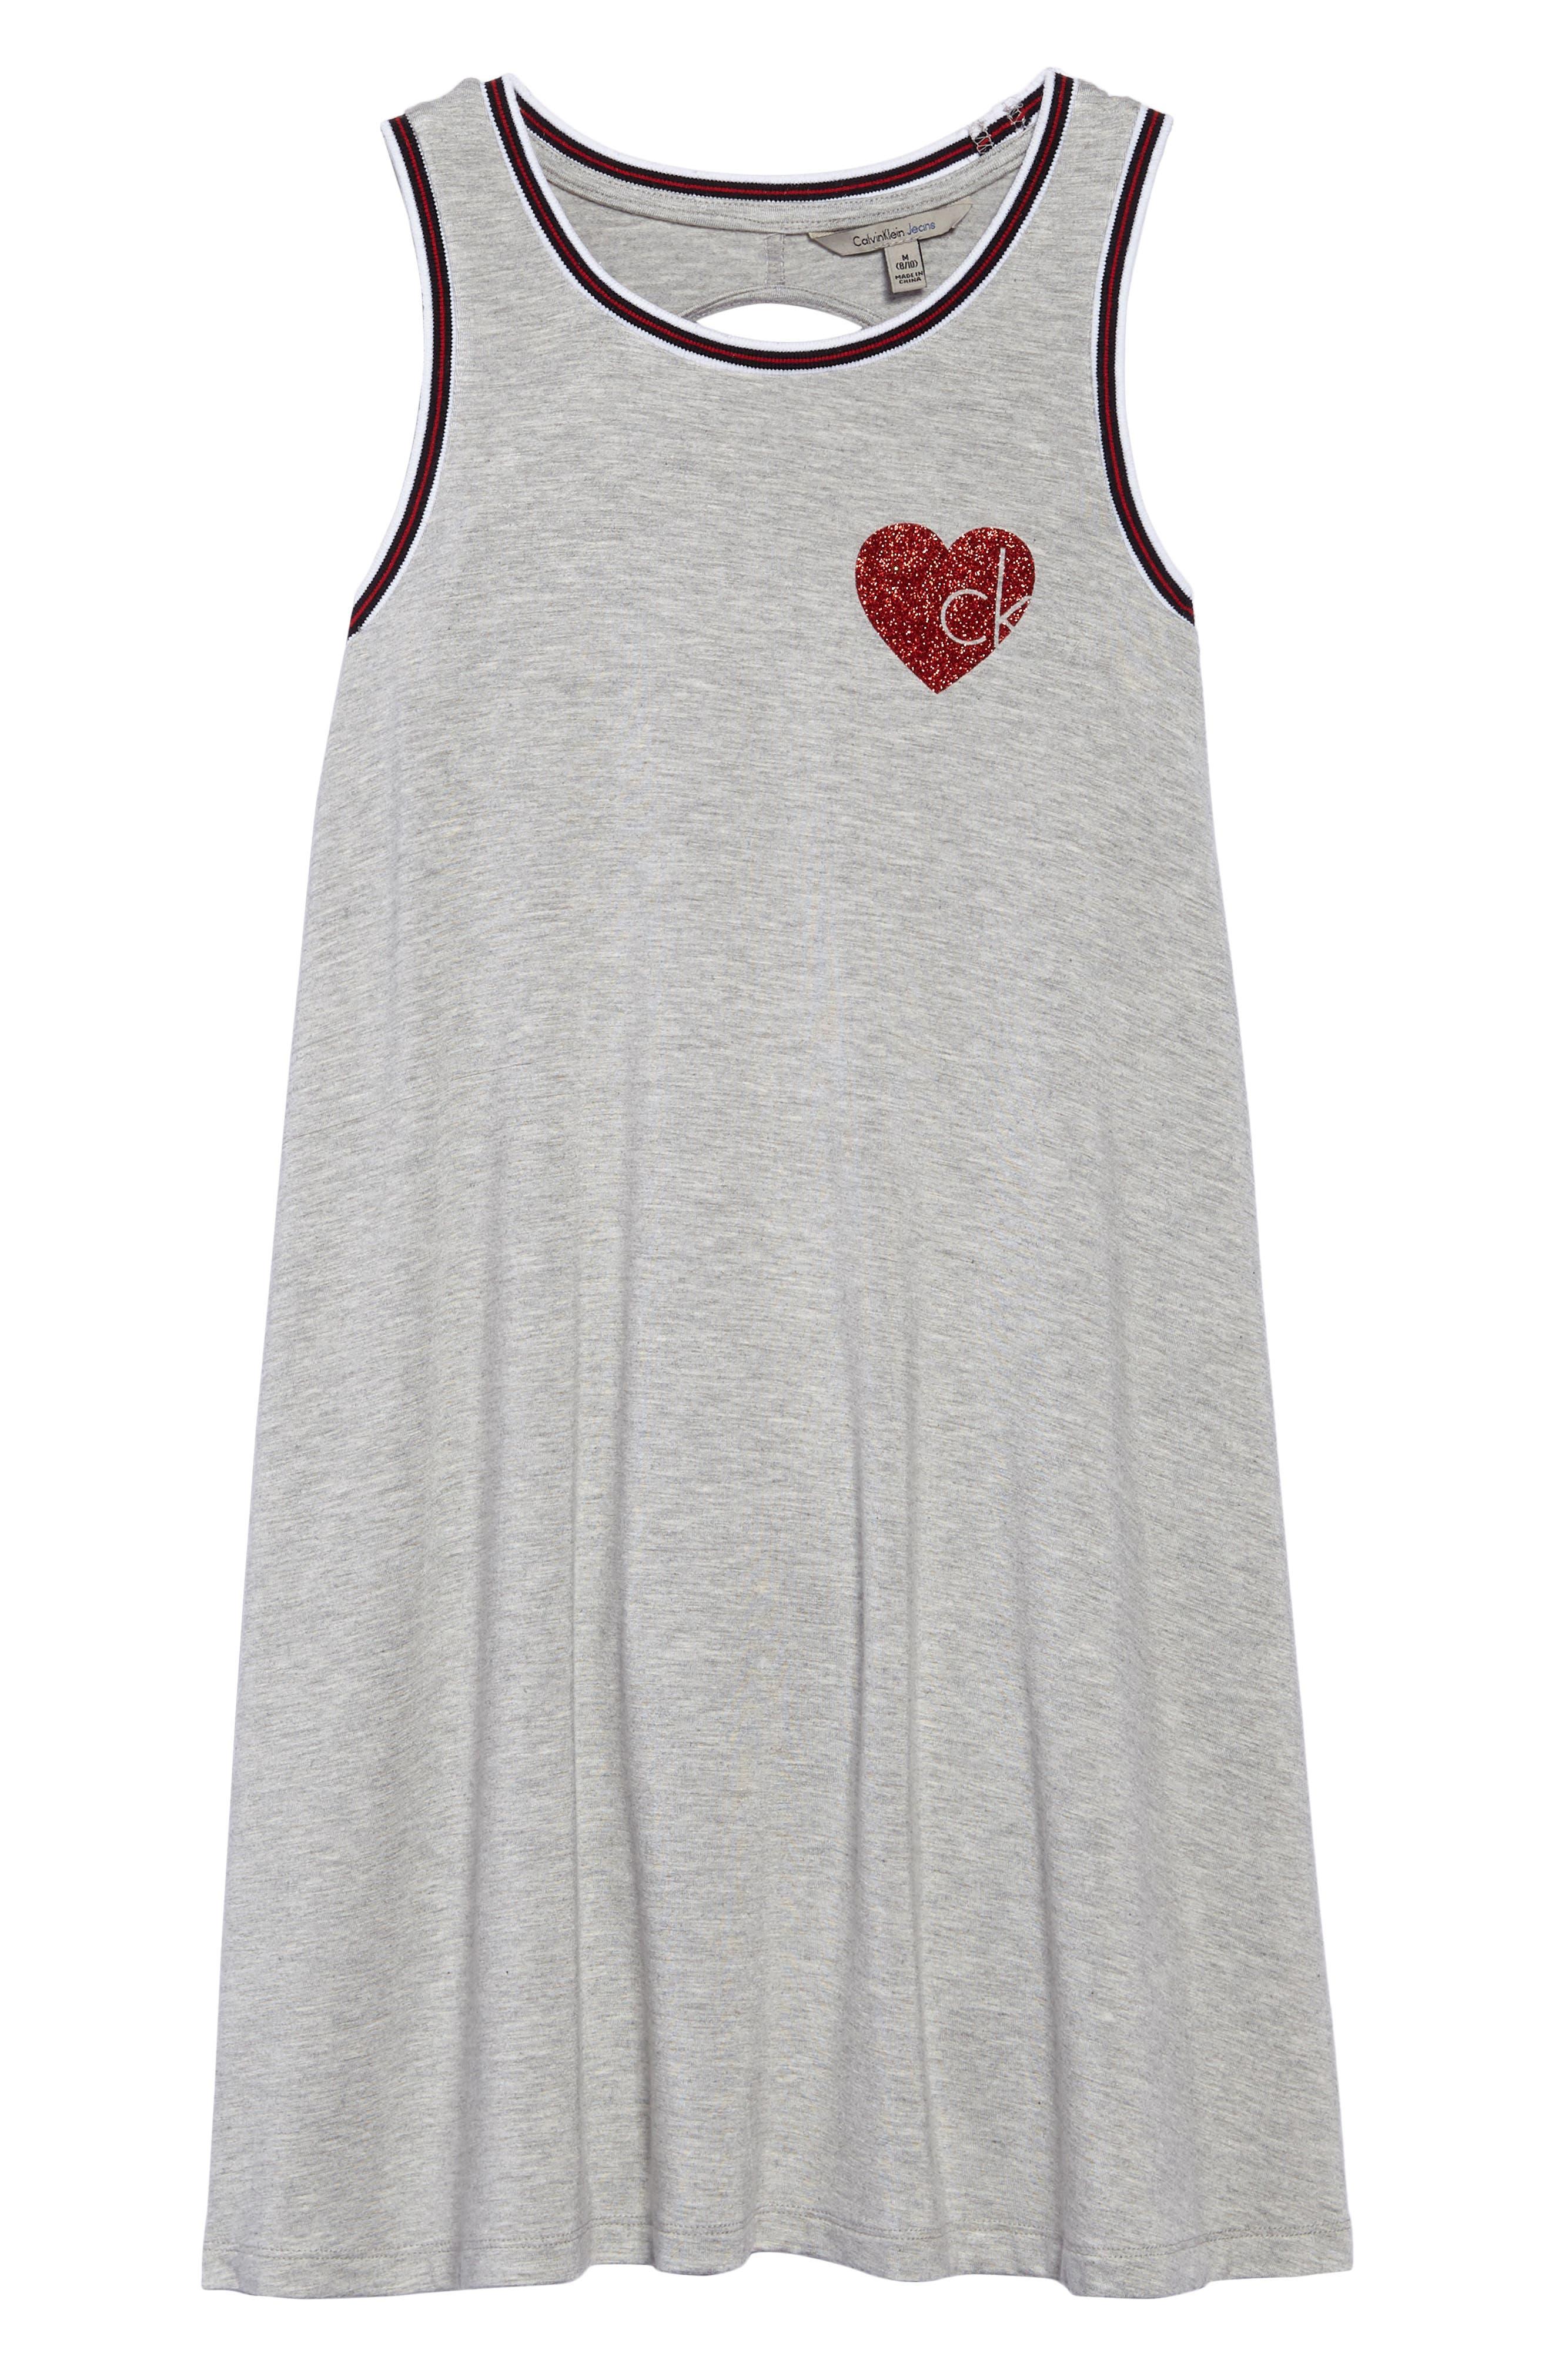 Athleisure Sleeveless Dress,                         Main,                         color, 020